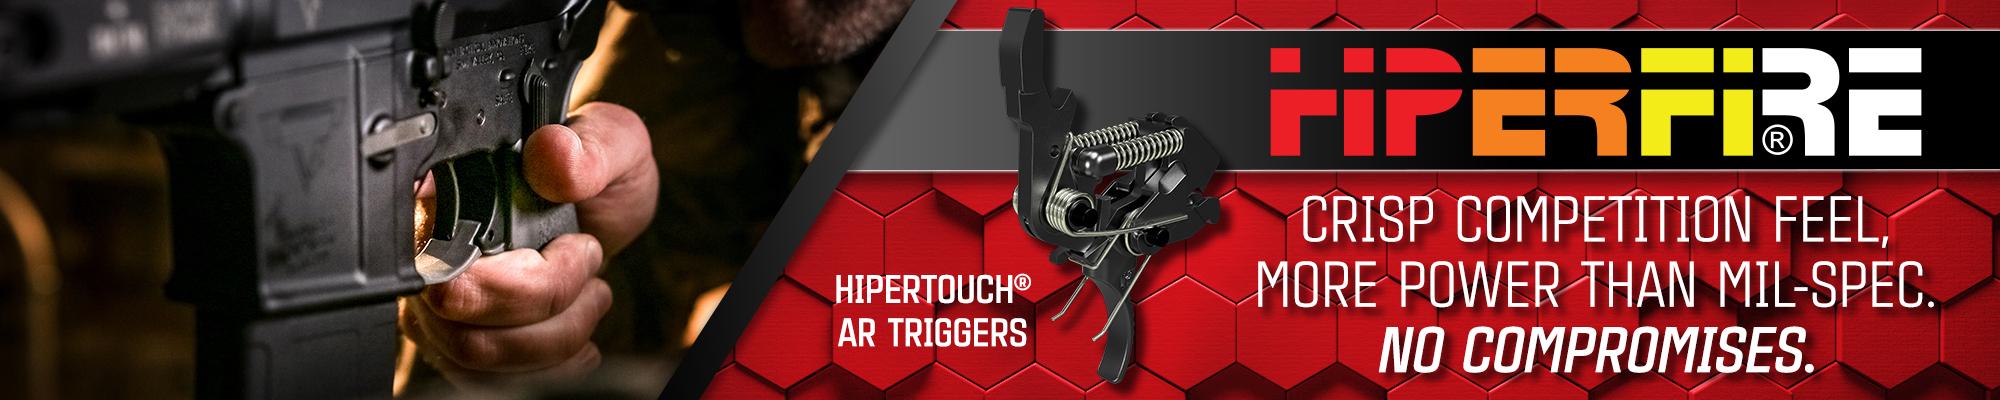 NEW PREMIUM 3 GUN CABINET WITH WOOD EFFECT FINISH SHOTGUN RIFLE AMMO SAFE